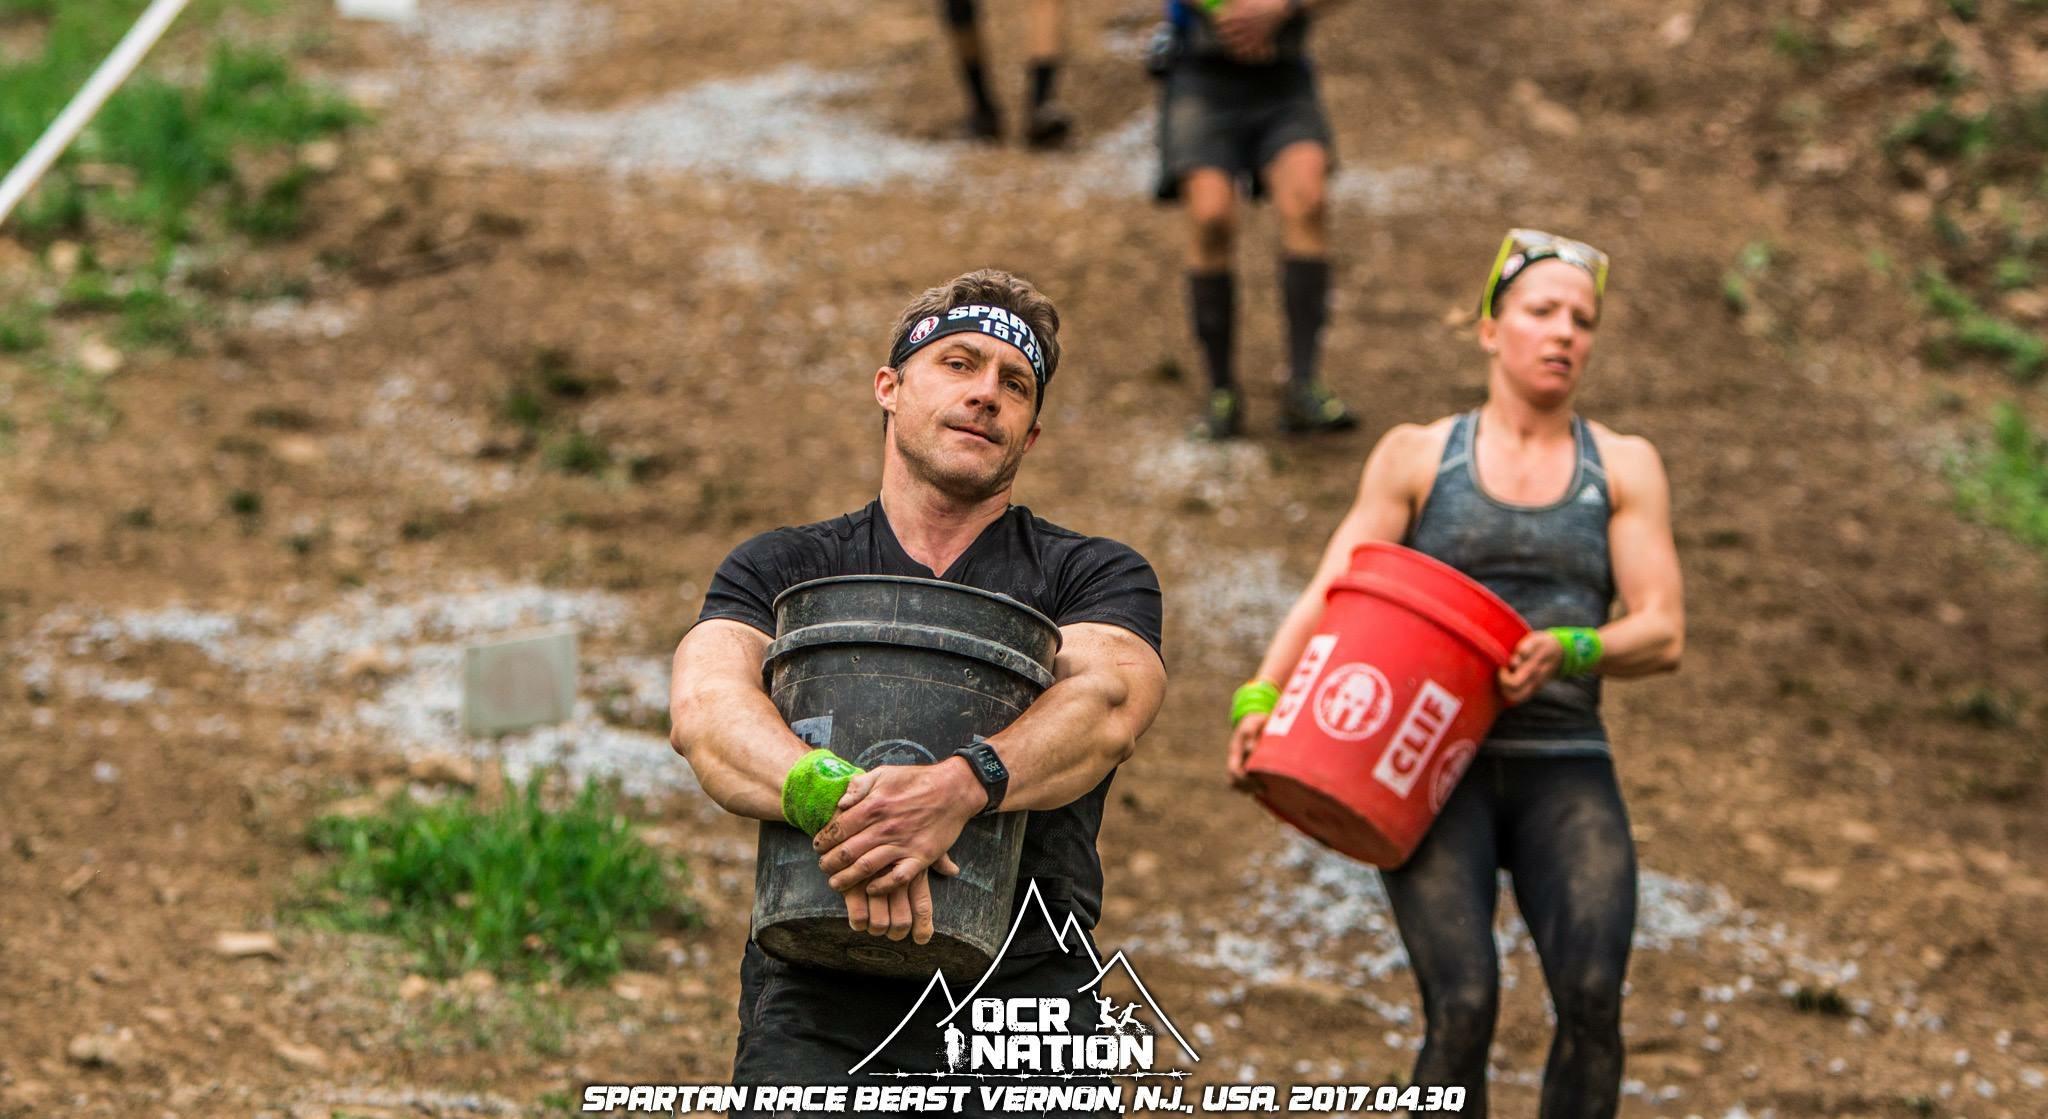 Spartan-NJ-UB-2017-Bucket-Carry-2